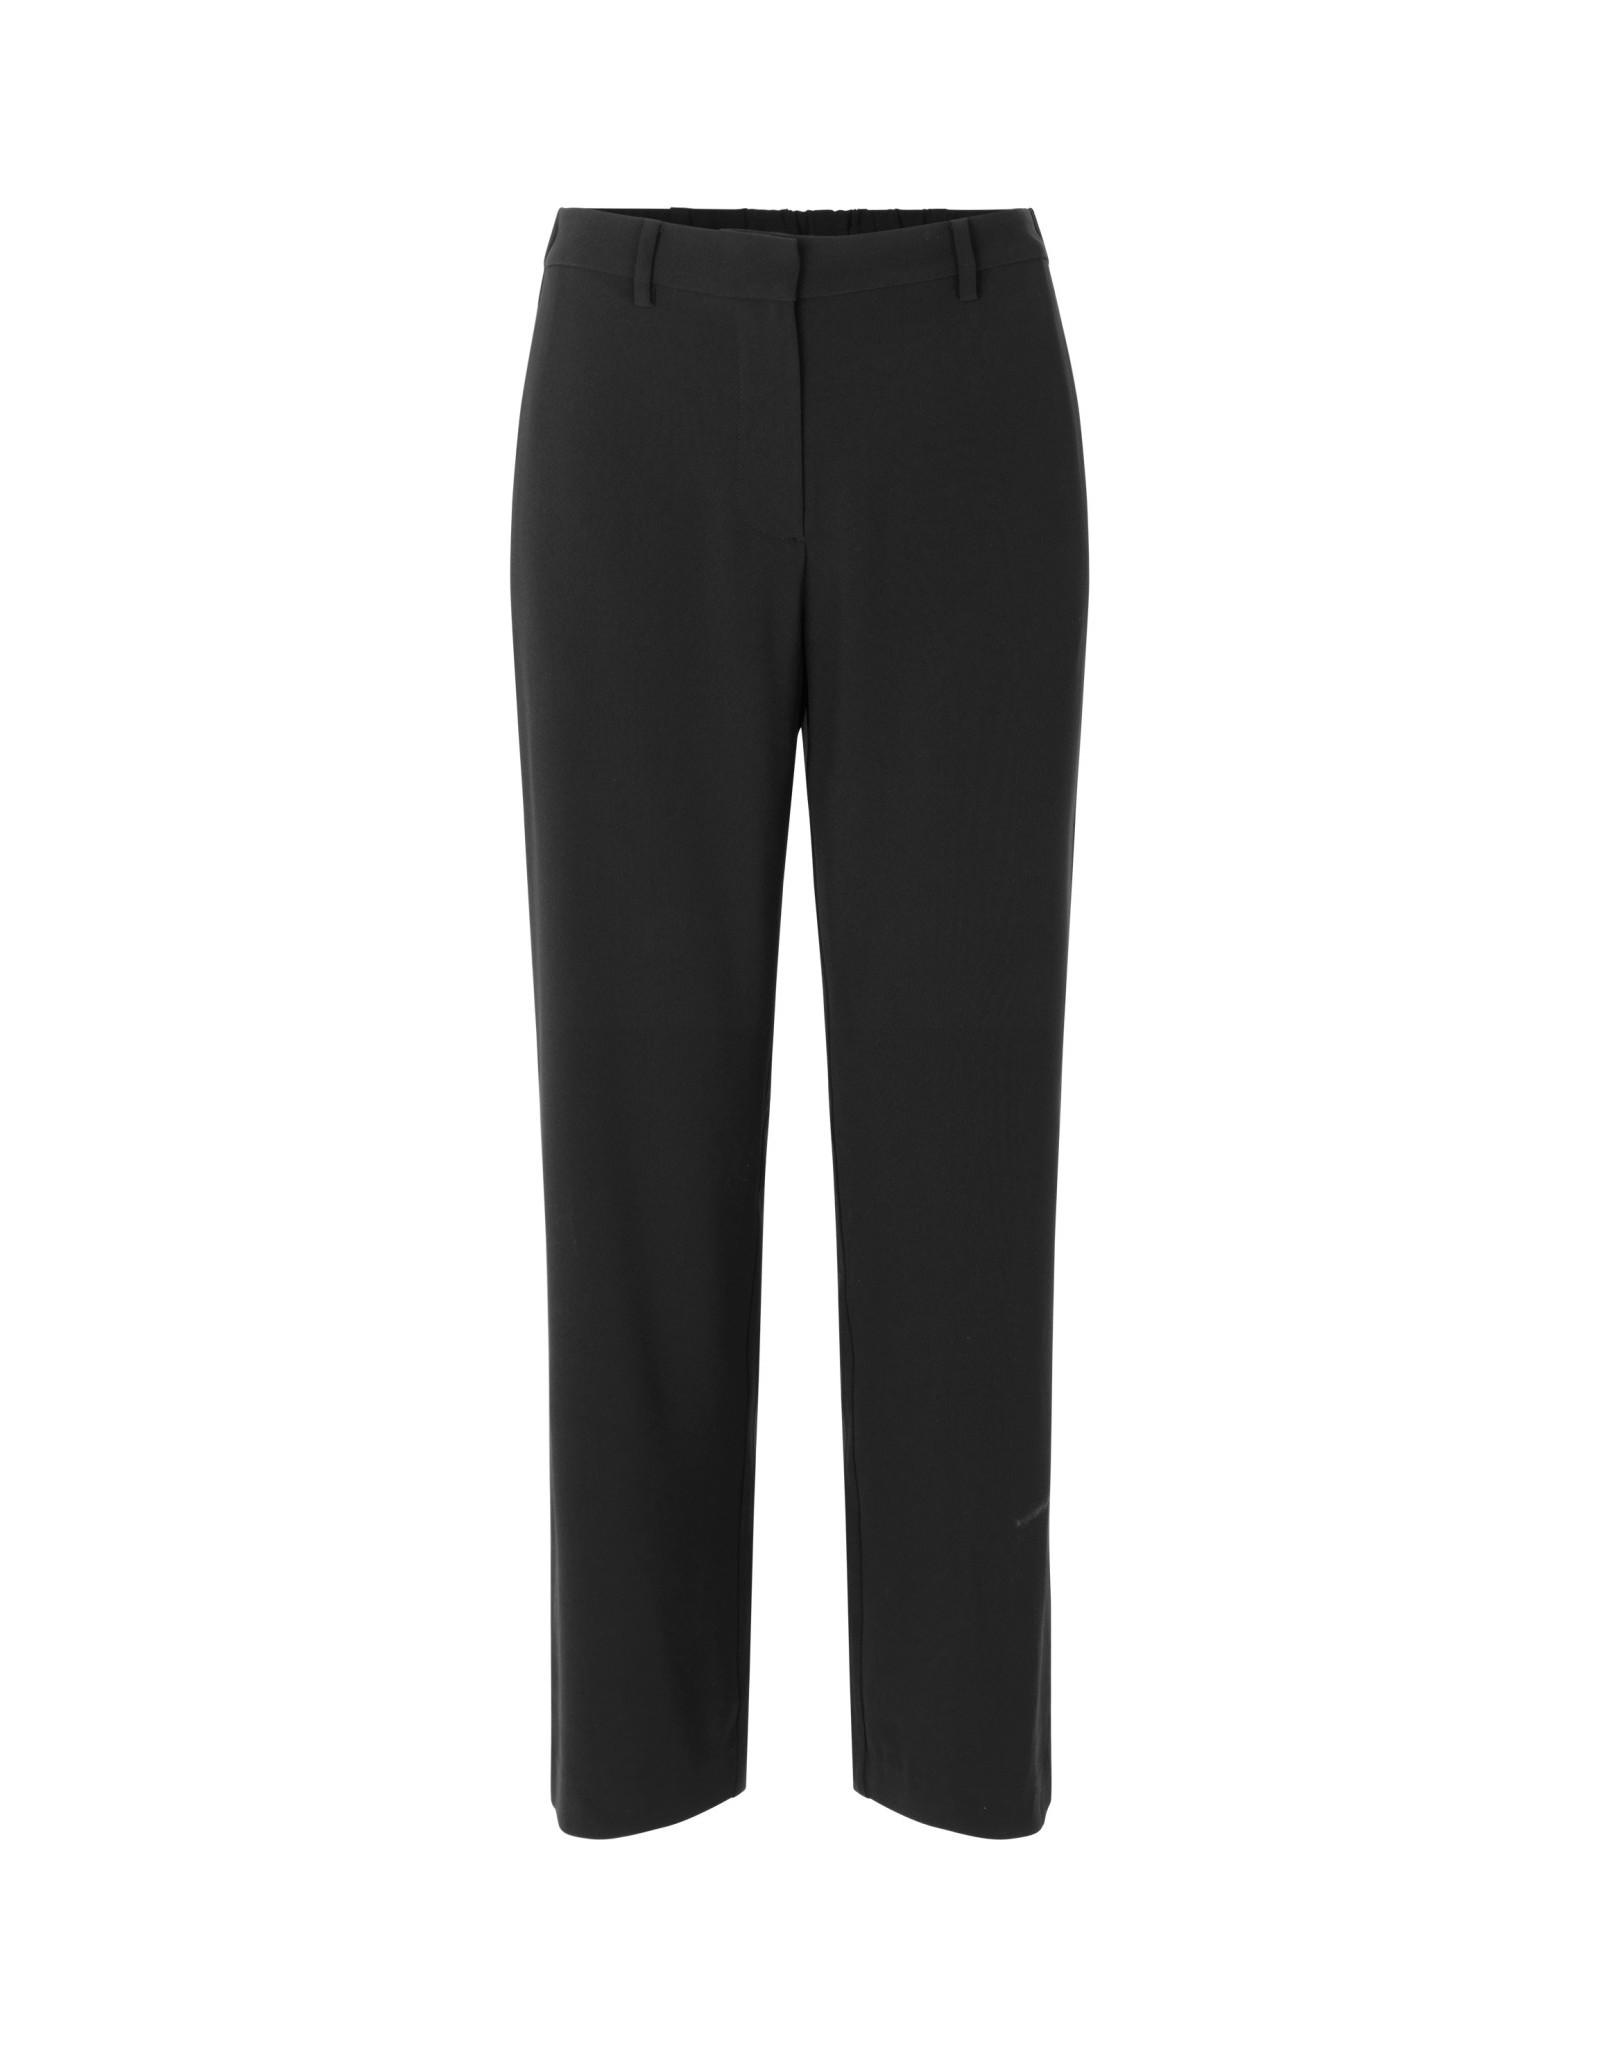 Samsoe & Samsoe Hoys f trousers Black